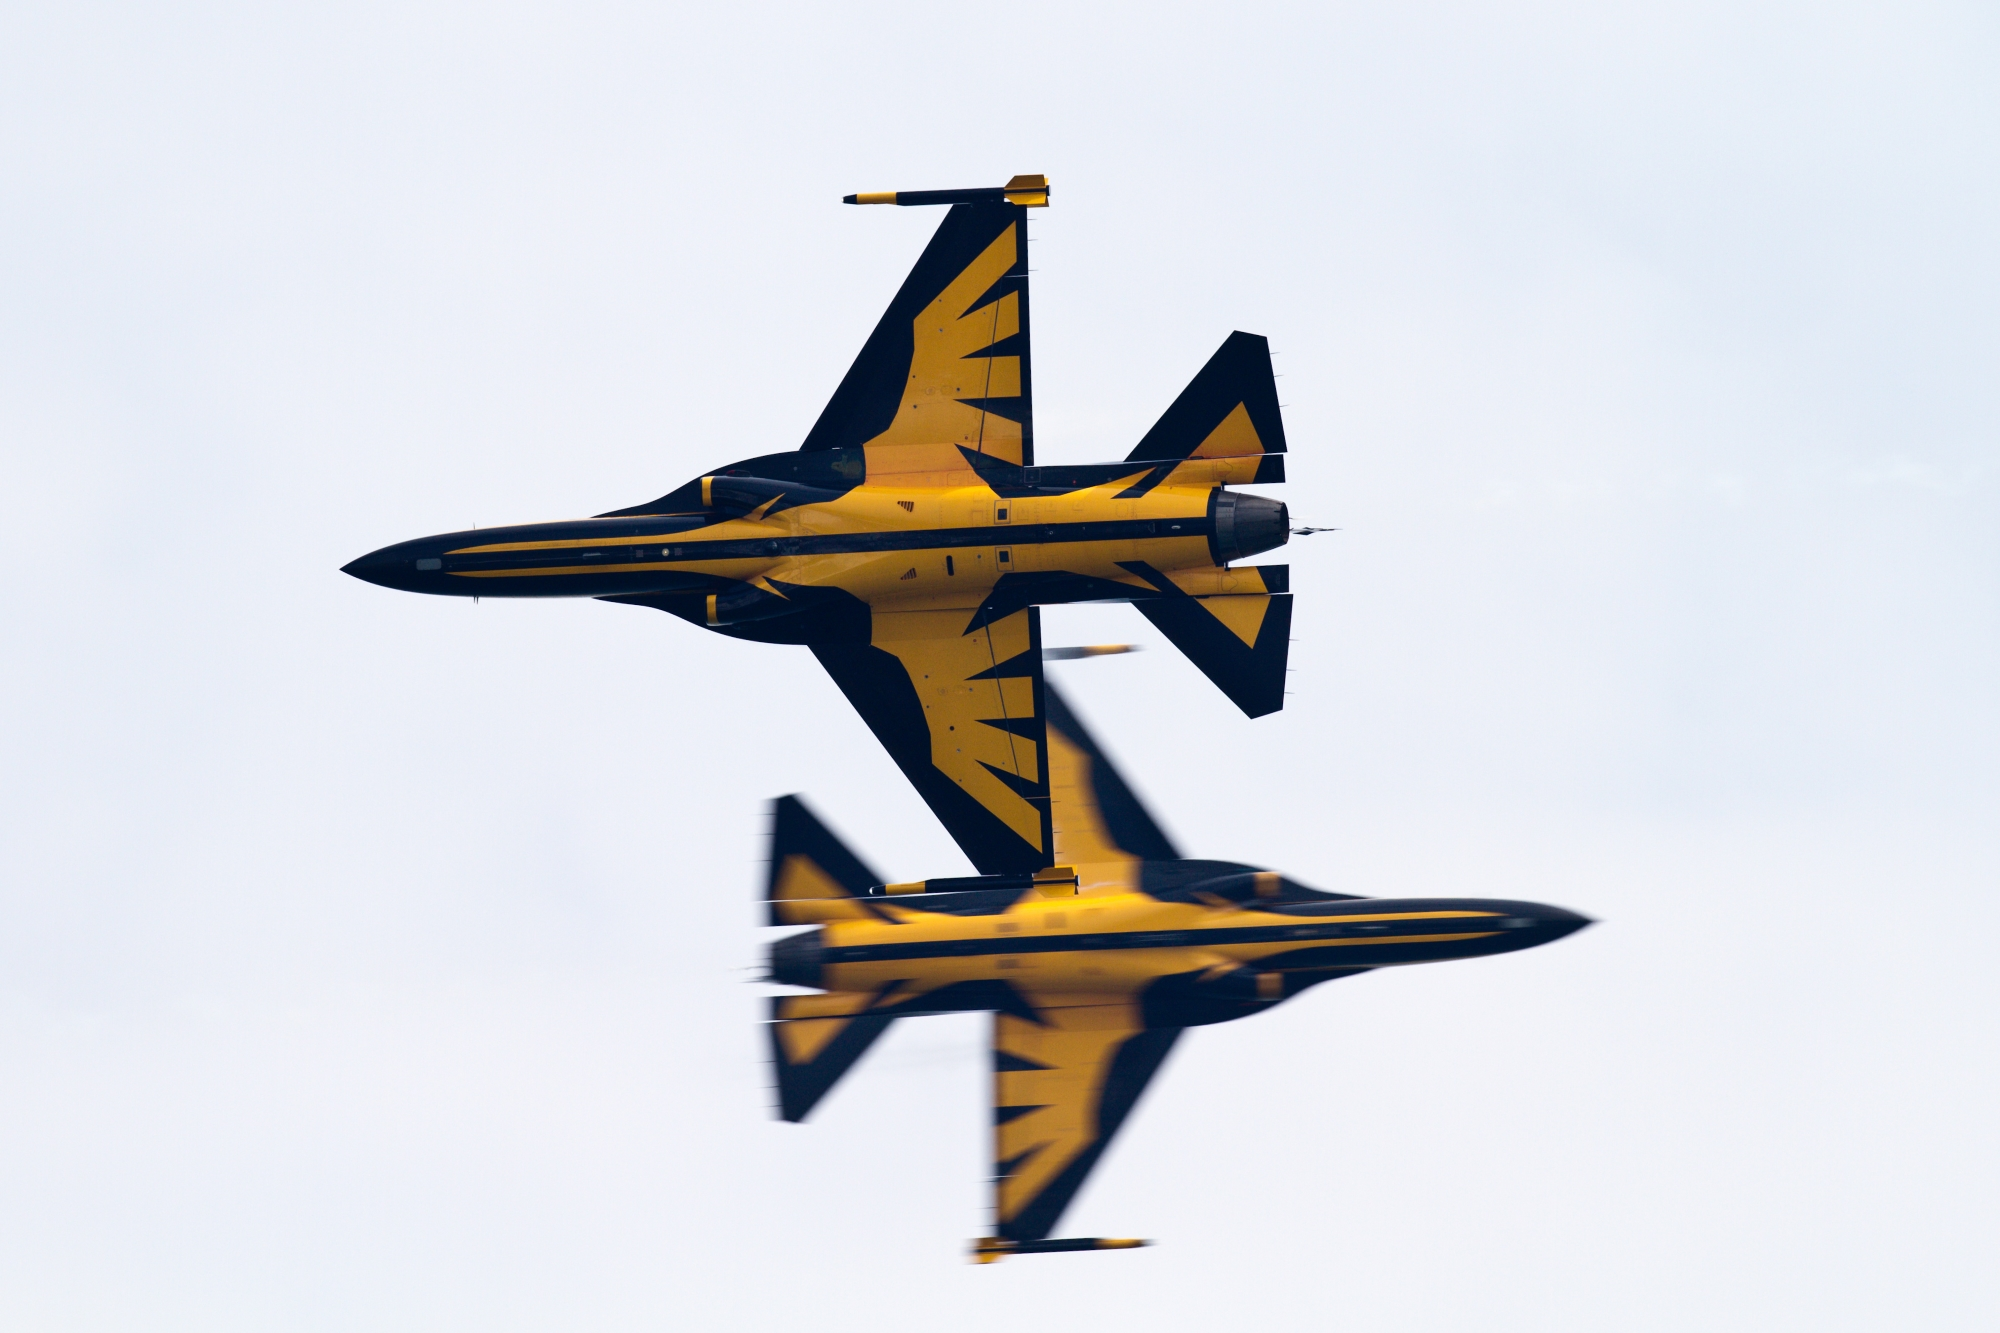 File:RoKAF Black Eagles Singapore Airshow 2014.jpg - Wikimedia Commons